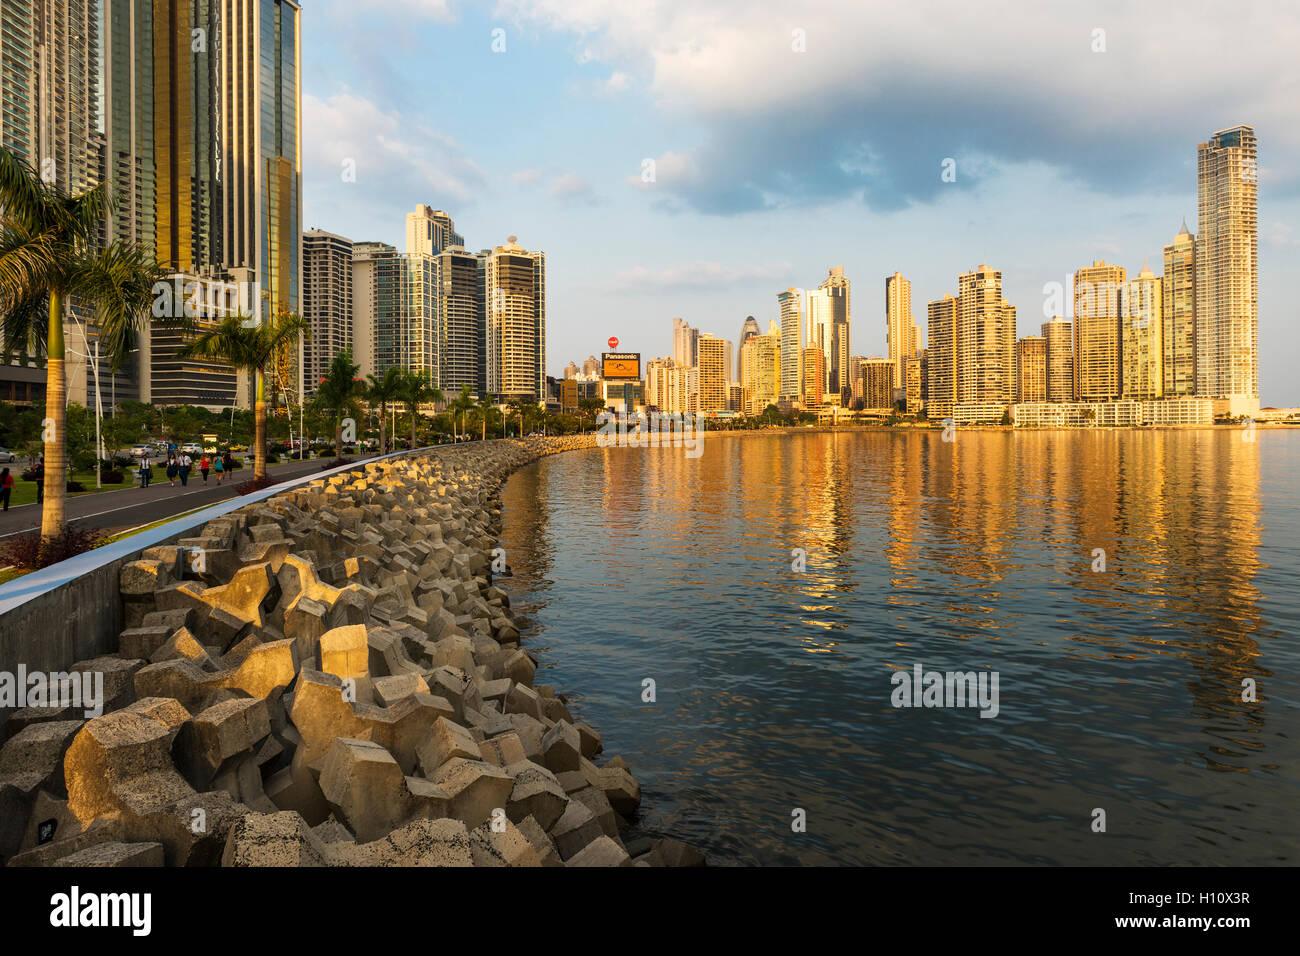 Panama-Stadt, Panama - 18. März 2014: Blick auf den financial District und Meer in Panama City, Panama, bei Stockbild